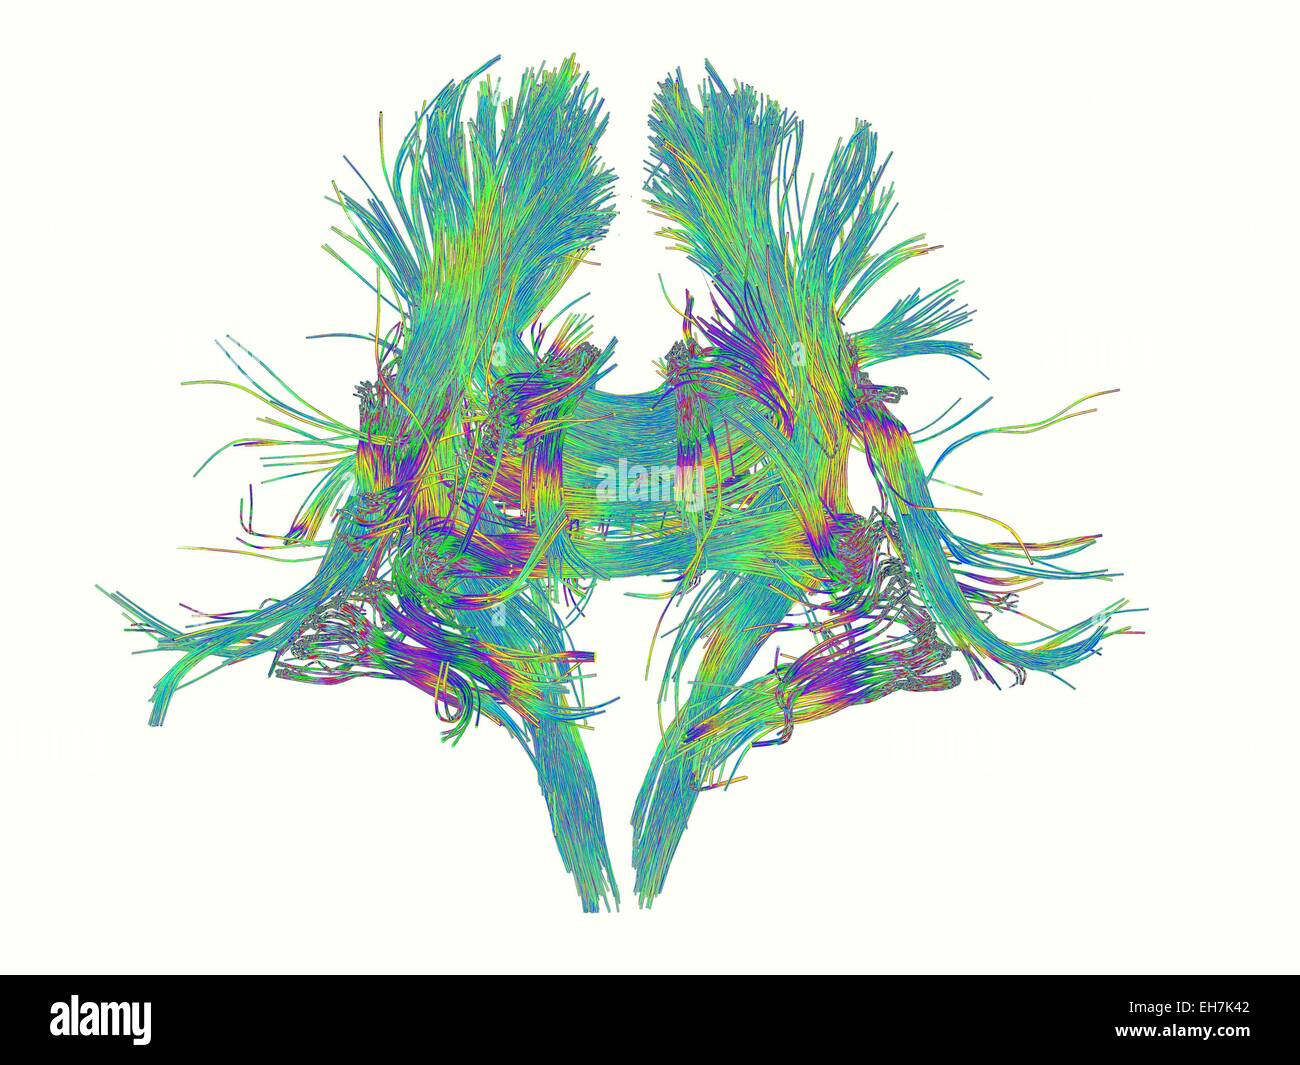 White matter fibres of the human brain - Stock Image